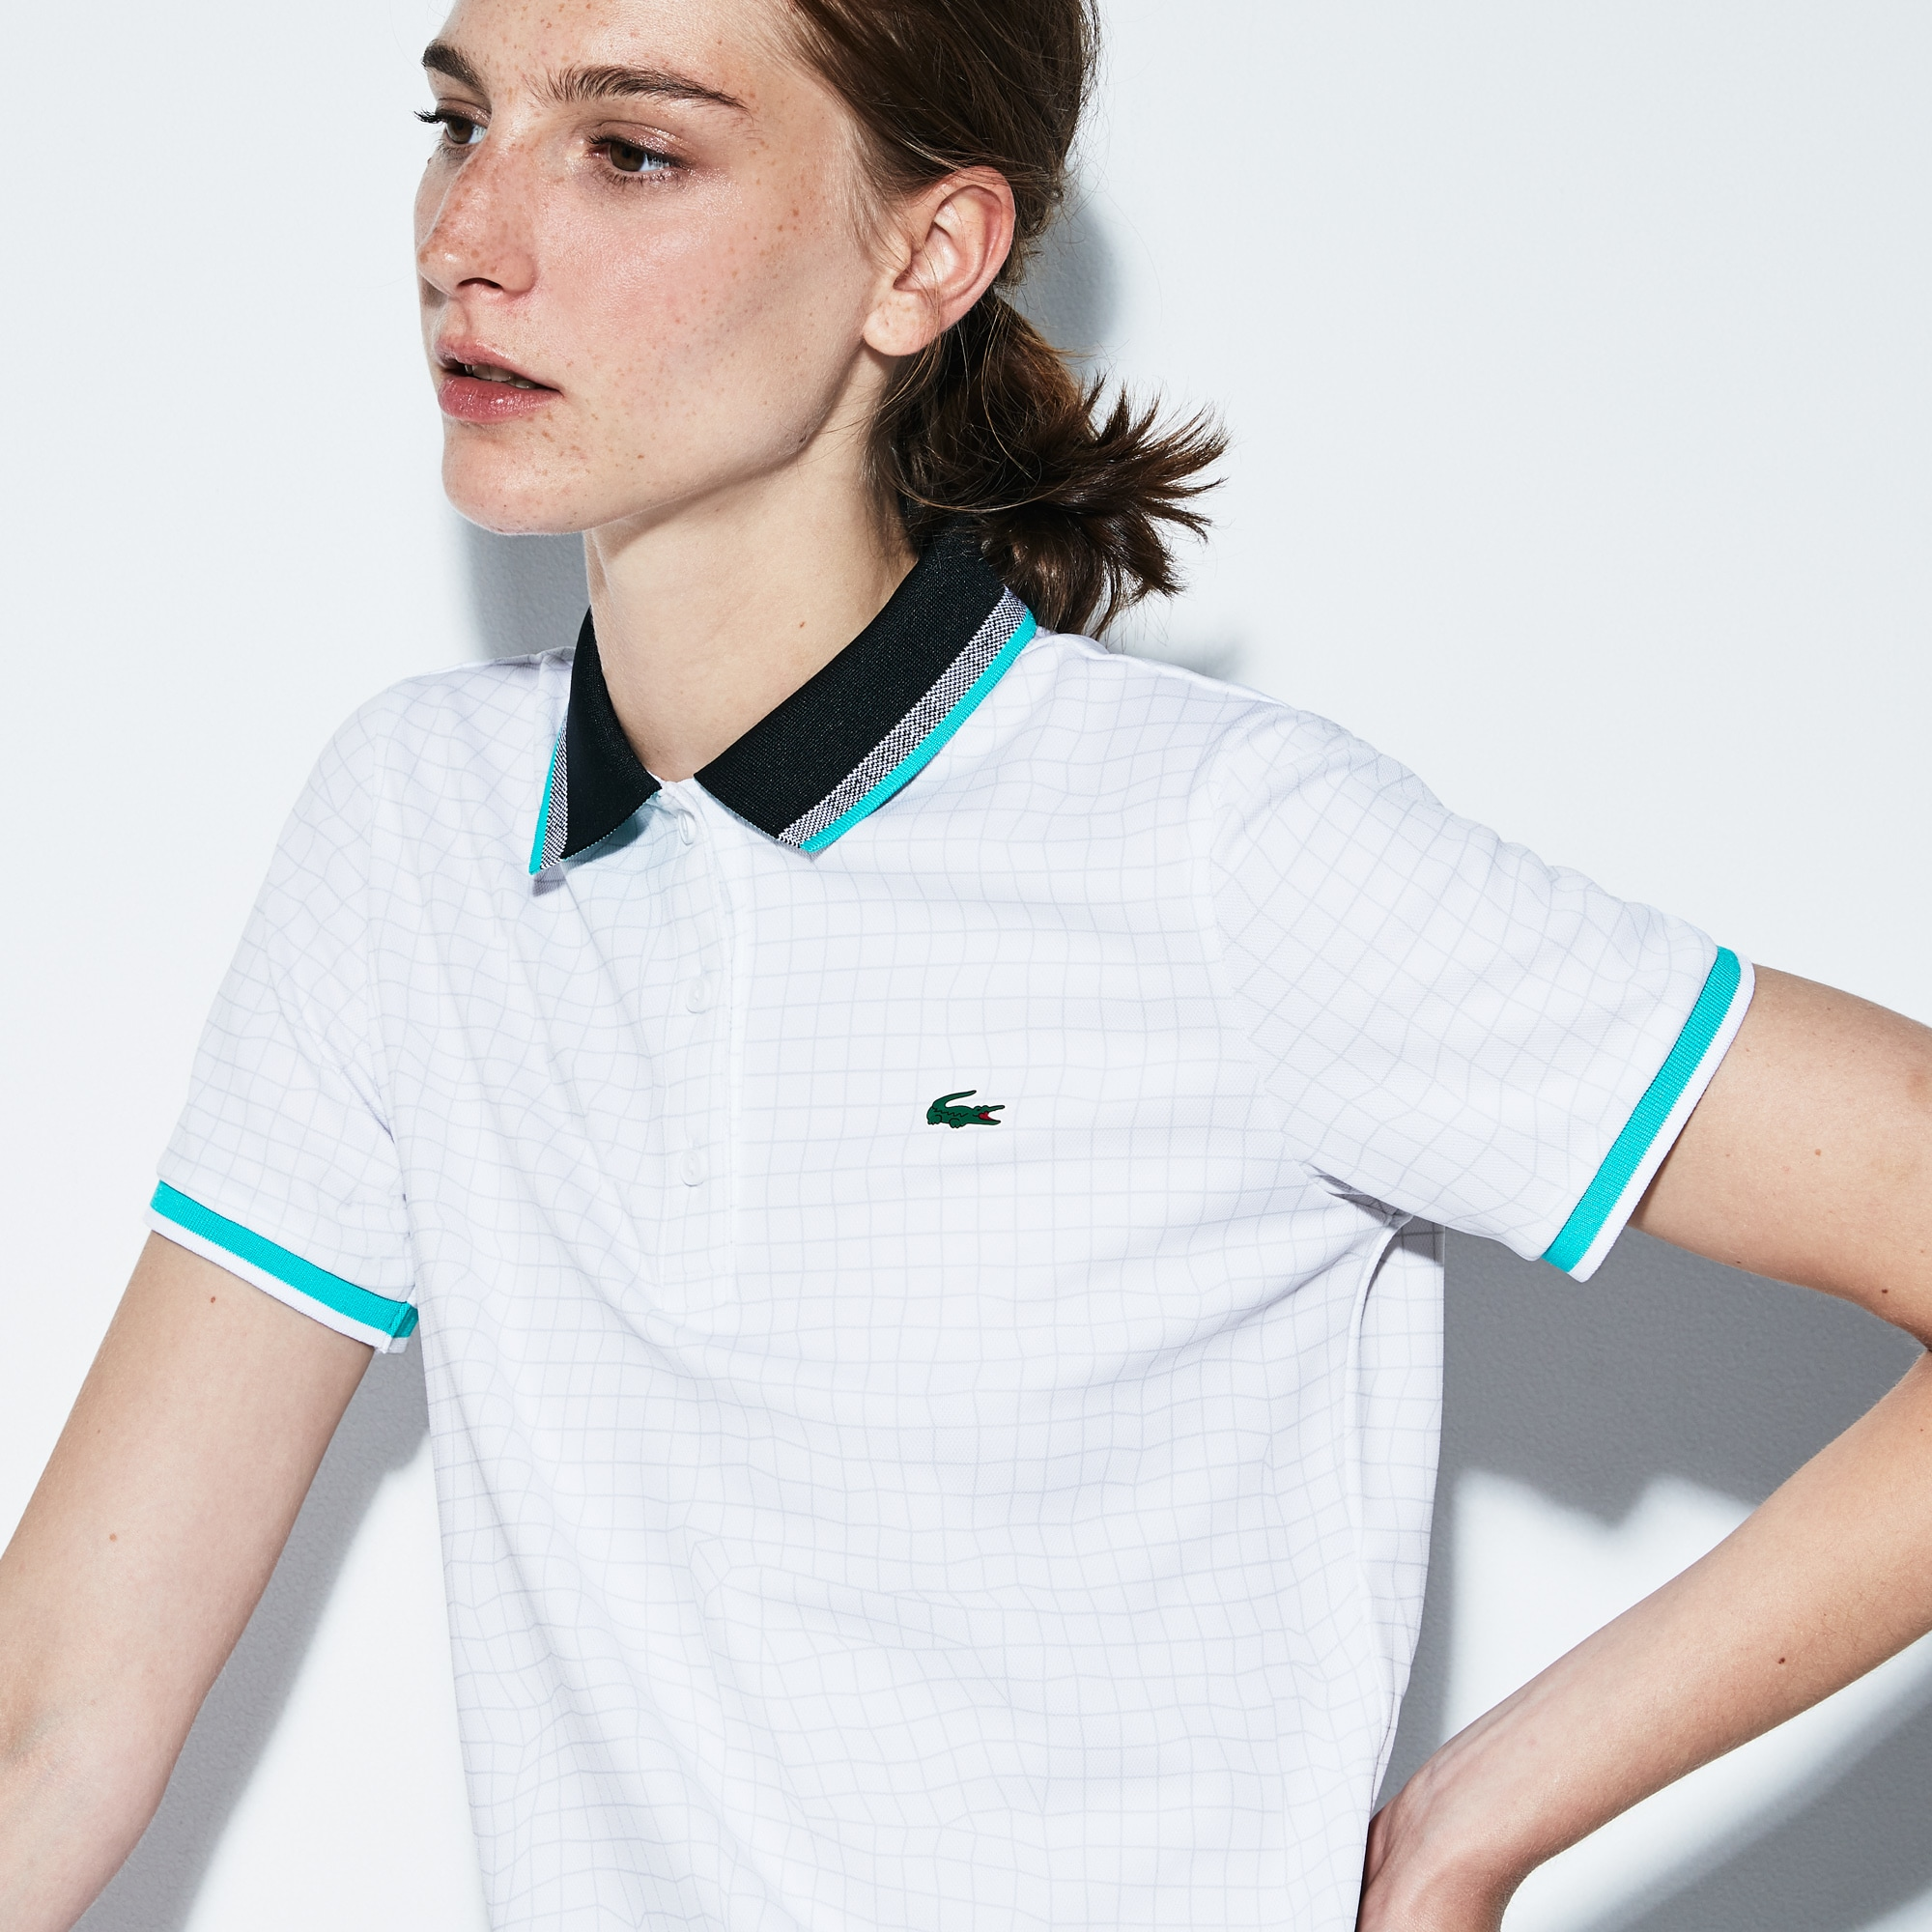 Lacoste SPORT女士网纹印花科技凸纹网眼面料网球polo衫